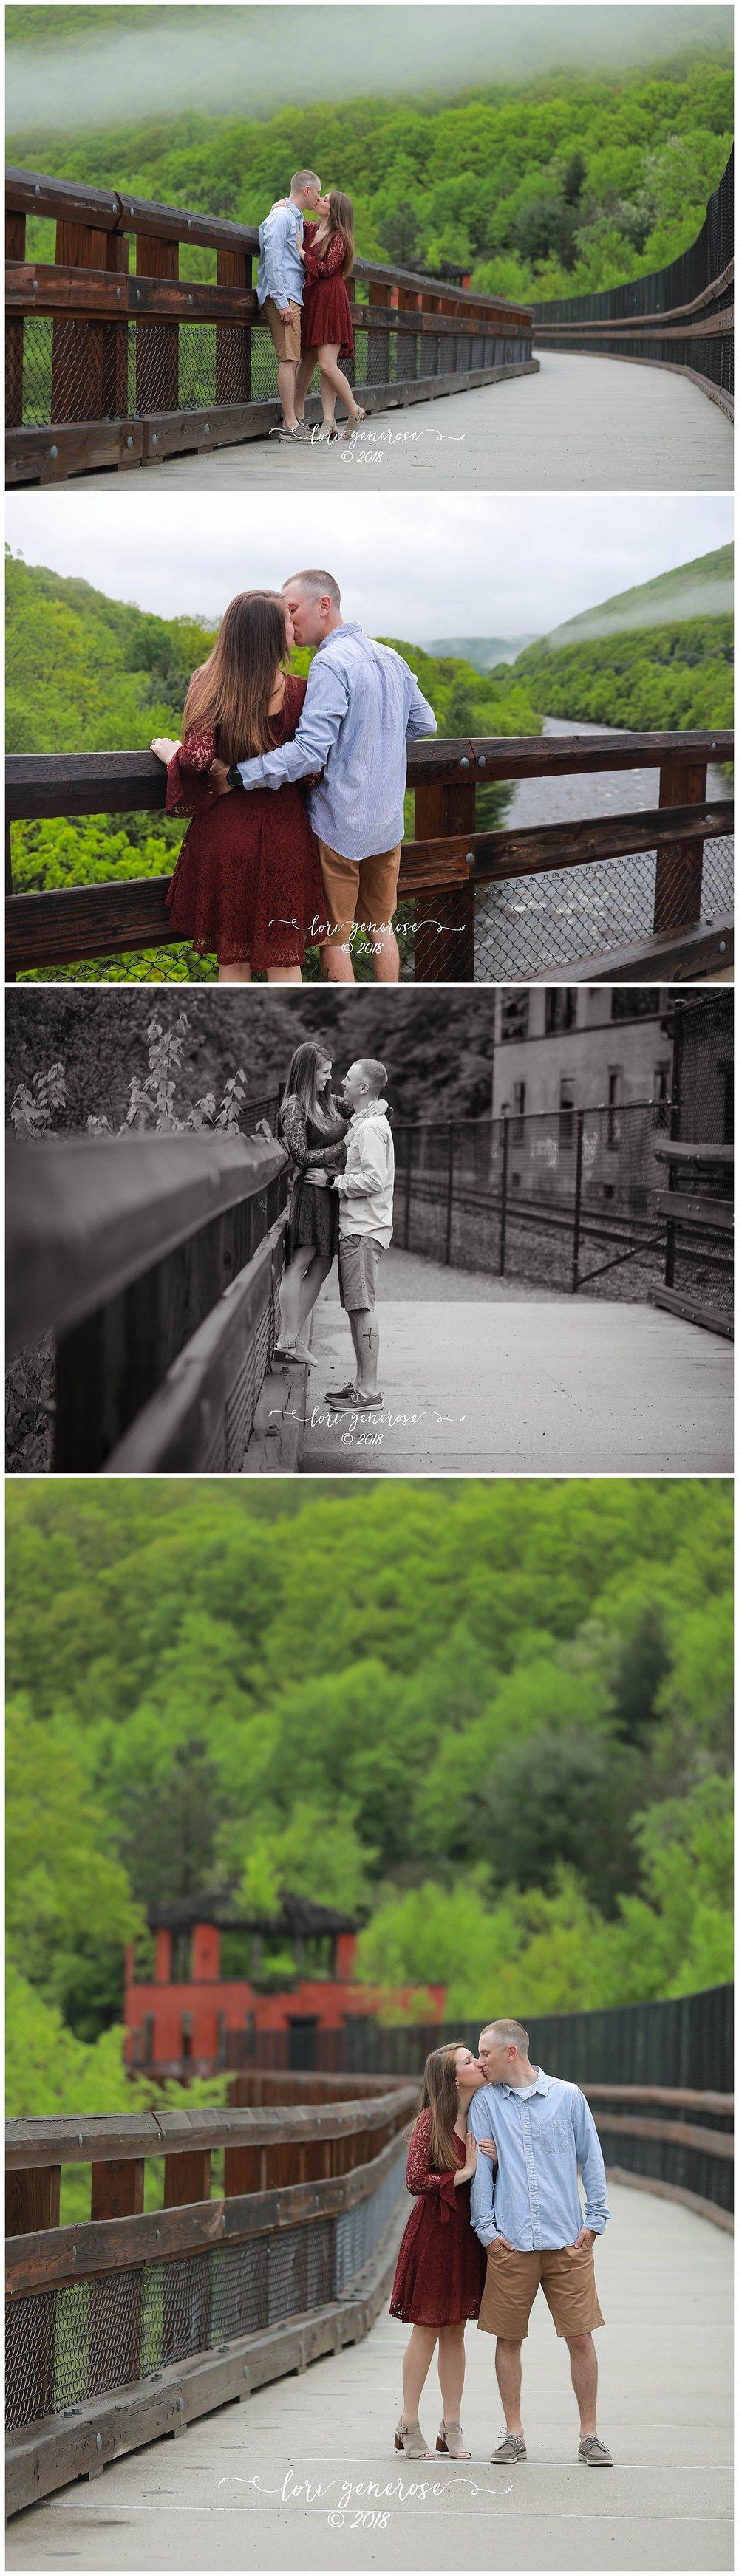 lgphotographybeautifulengagementcoupleonwalkingbridgeglenonokofallsjimthorpepa.jpg